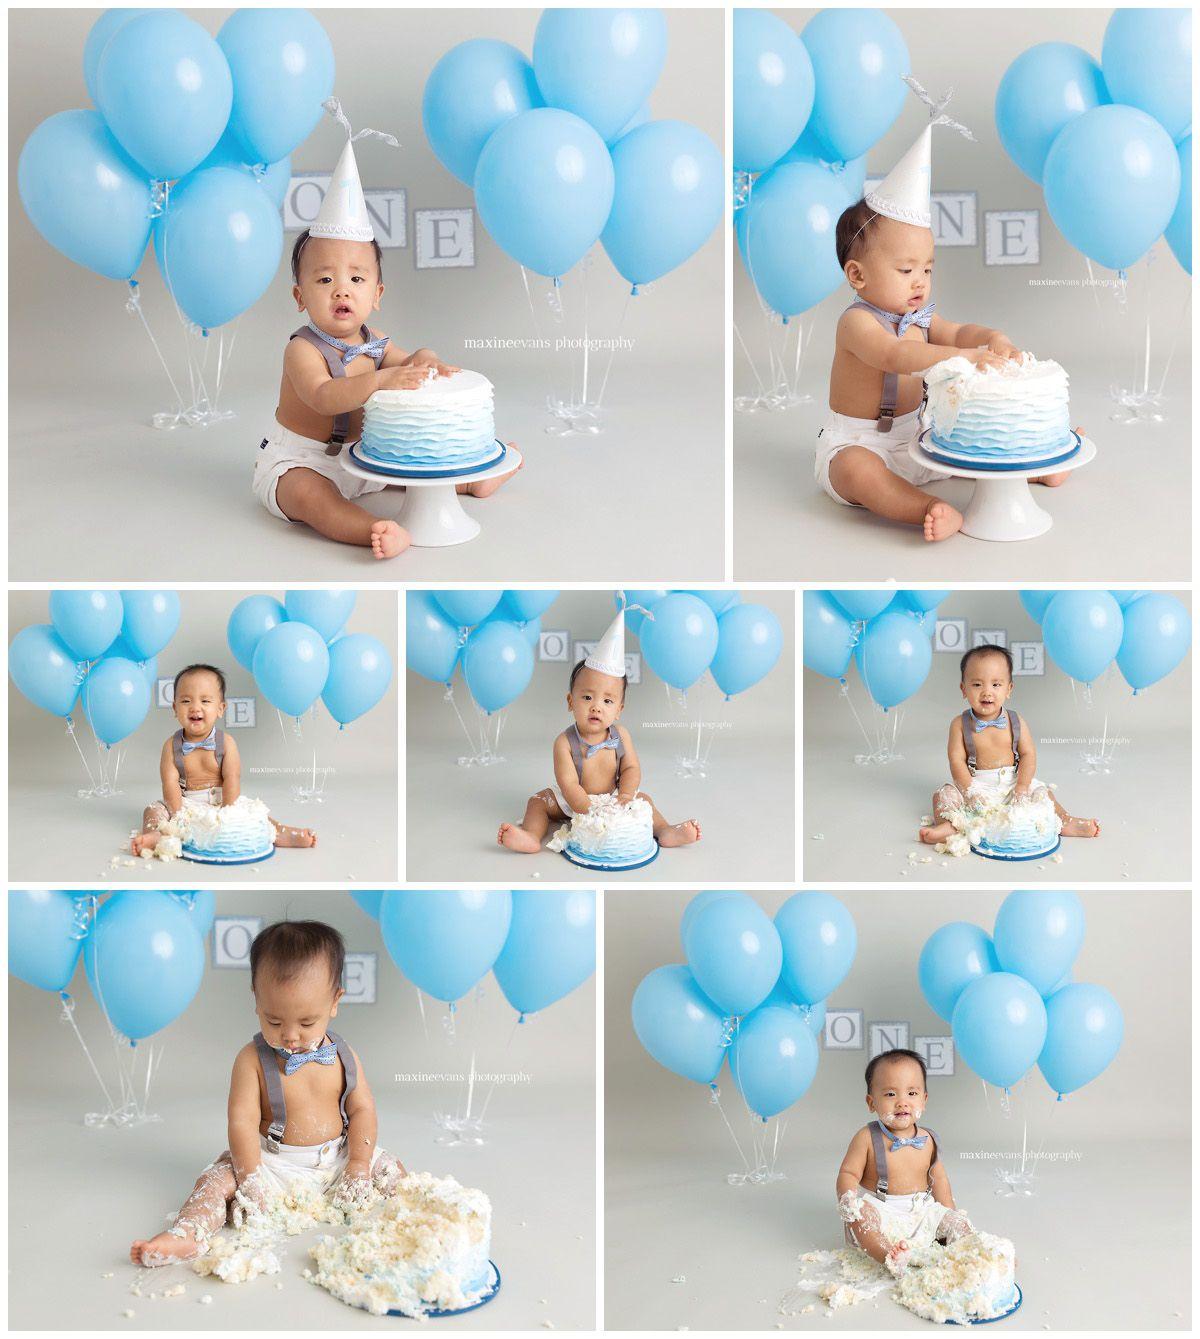 Baby Boy Cake Smash Blue Www Maxineevansphotography Com Los